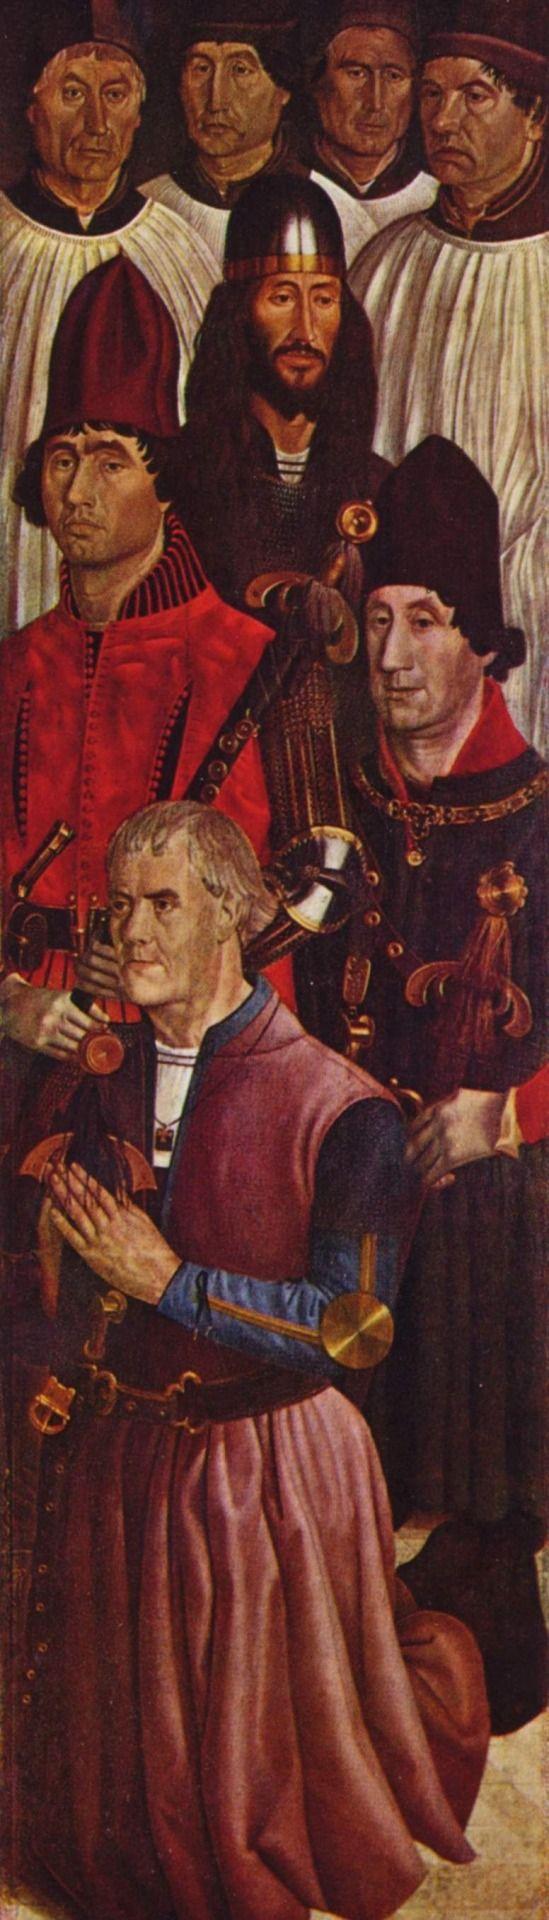 Nuño Gonçalves. Vinzenz-Altar, Flügel: Die Ritter mit kniendem Stifter. 1465-1467, Holz, 207 × 61 cm. Lissabon, Museu Nacional de Arte Antiga. Portugal. Renaissance. KO 02948